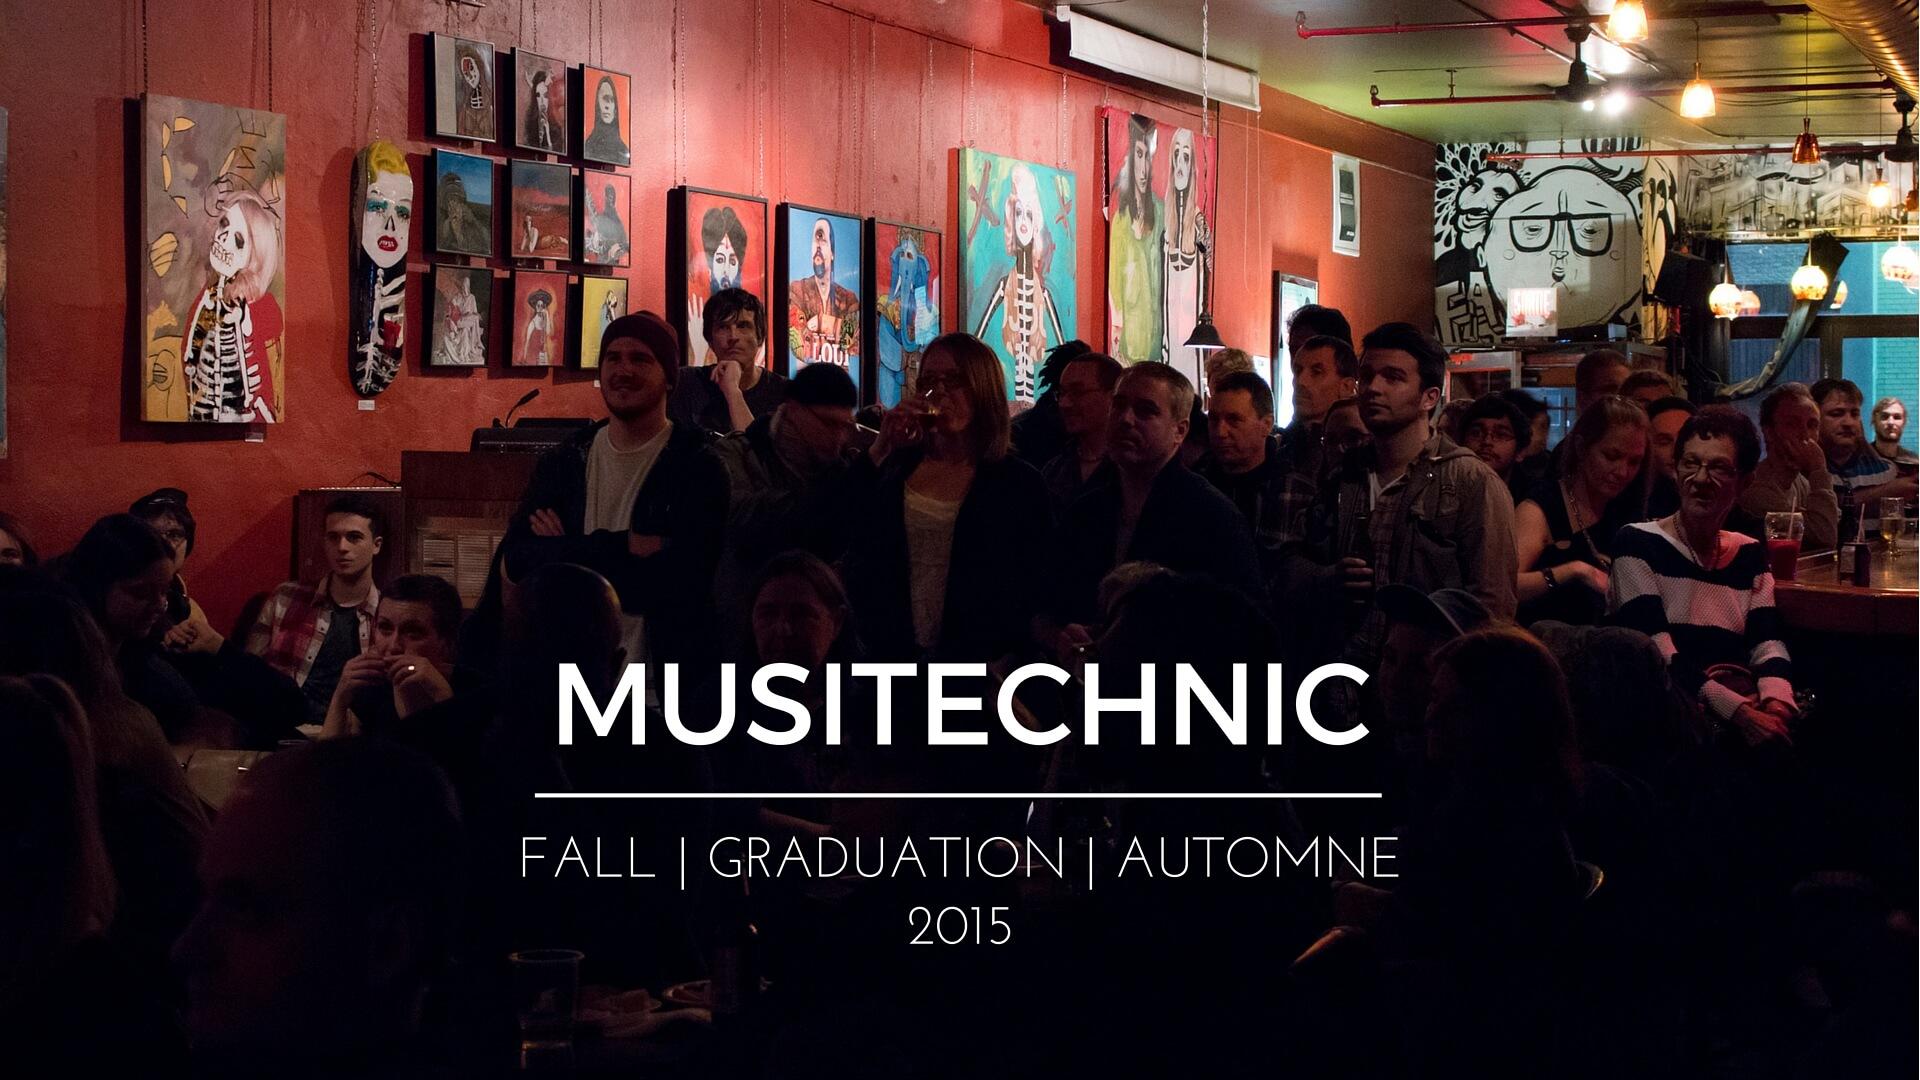 Graduation Automne 2015